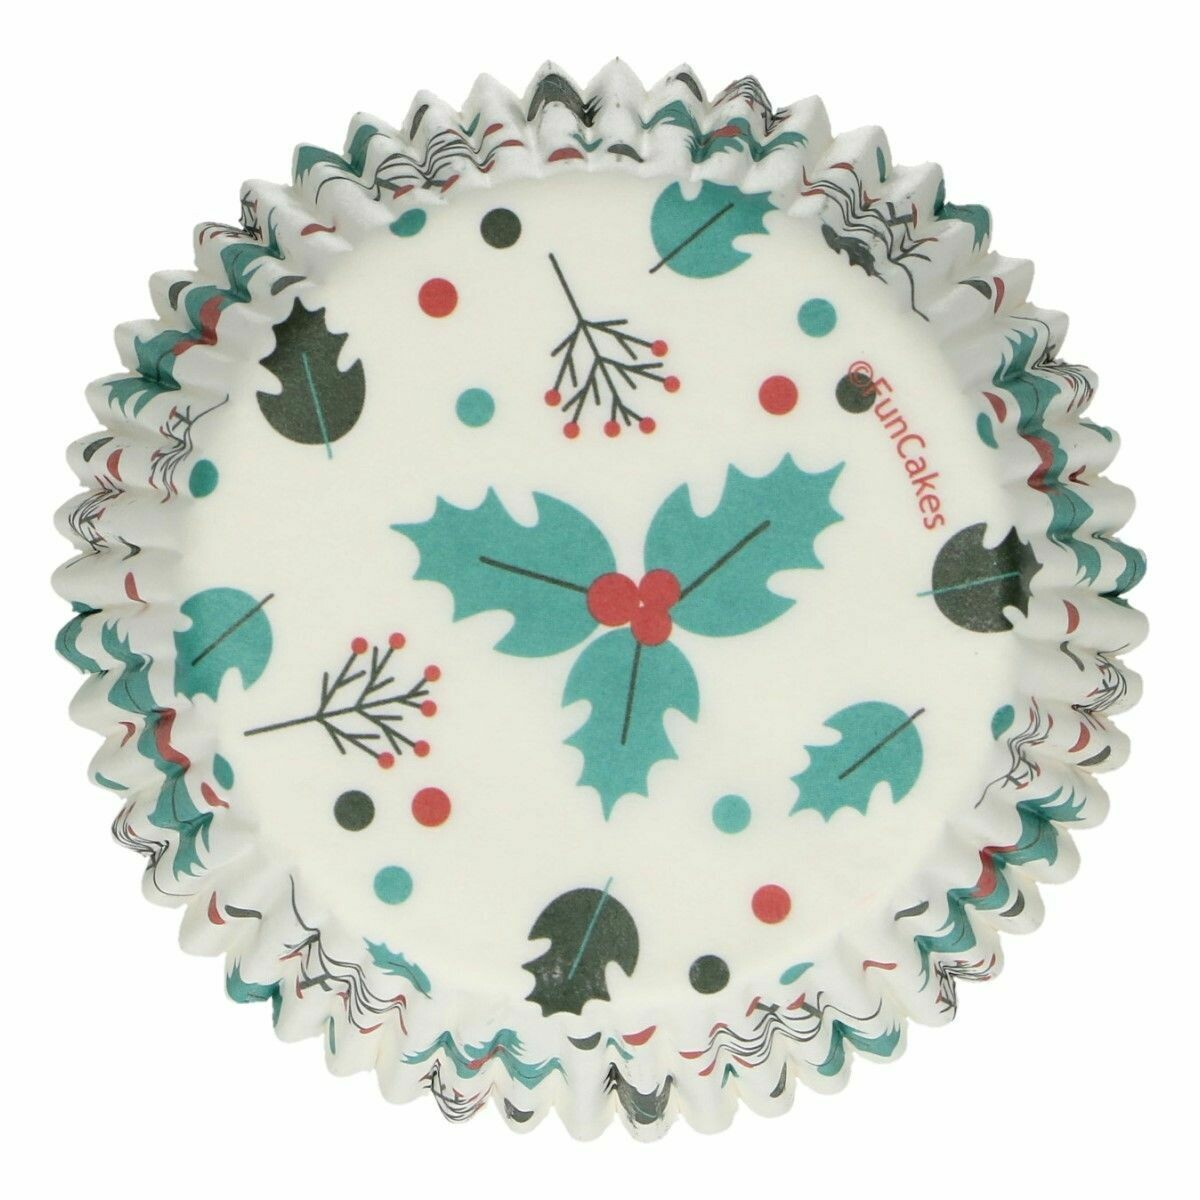 FunCakes Cupcake Cases -CHRISTMAS -HOLLY LEAF -Θήκες Ψησίματος 48 τεμ